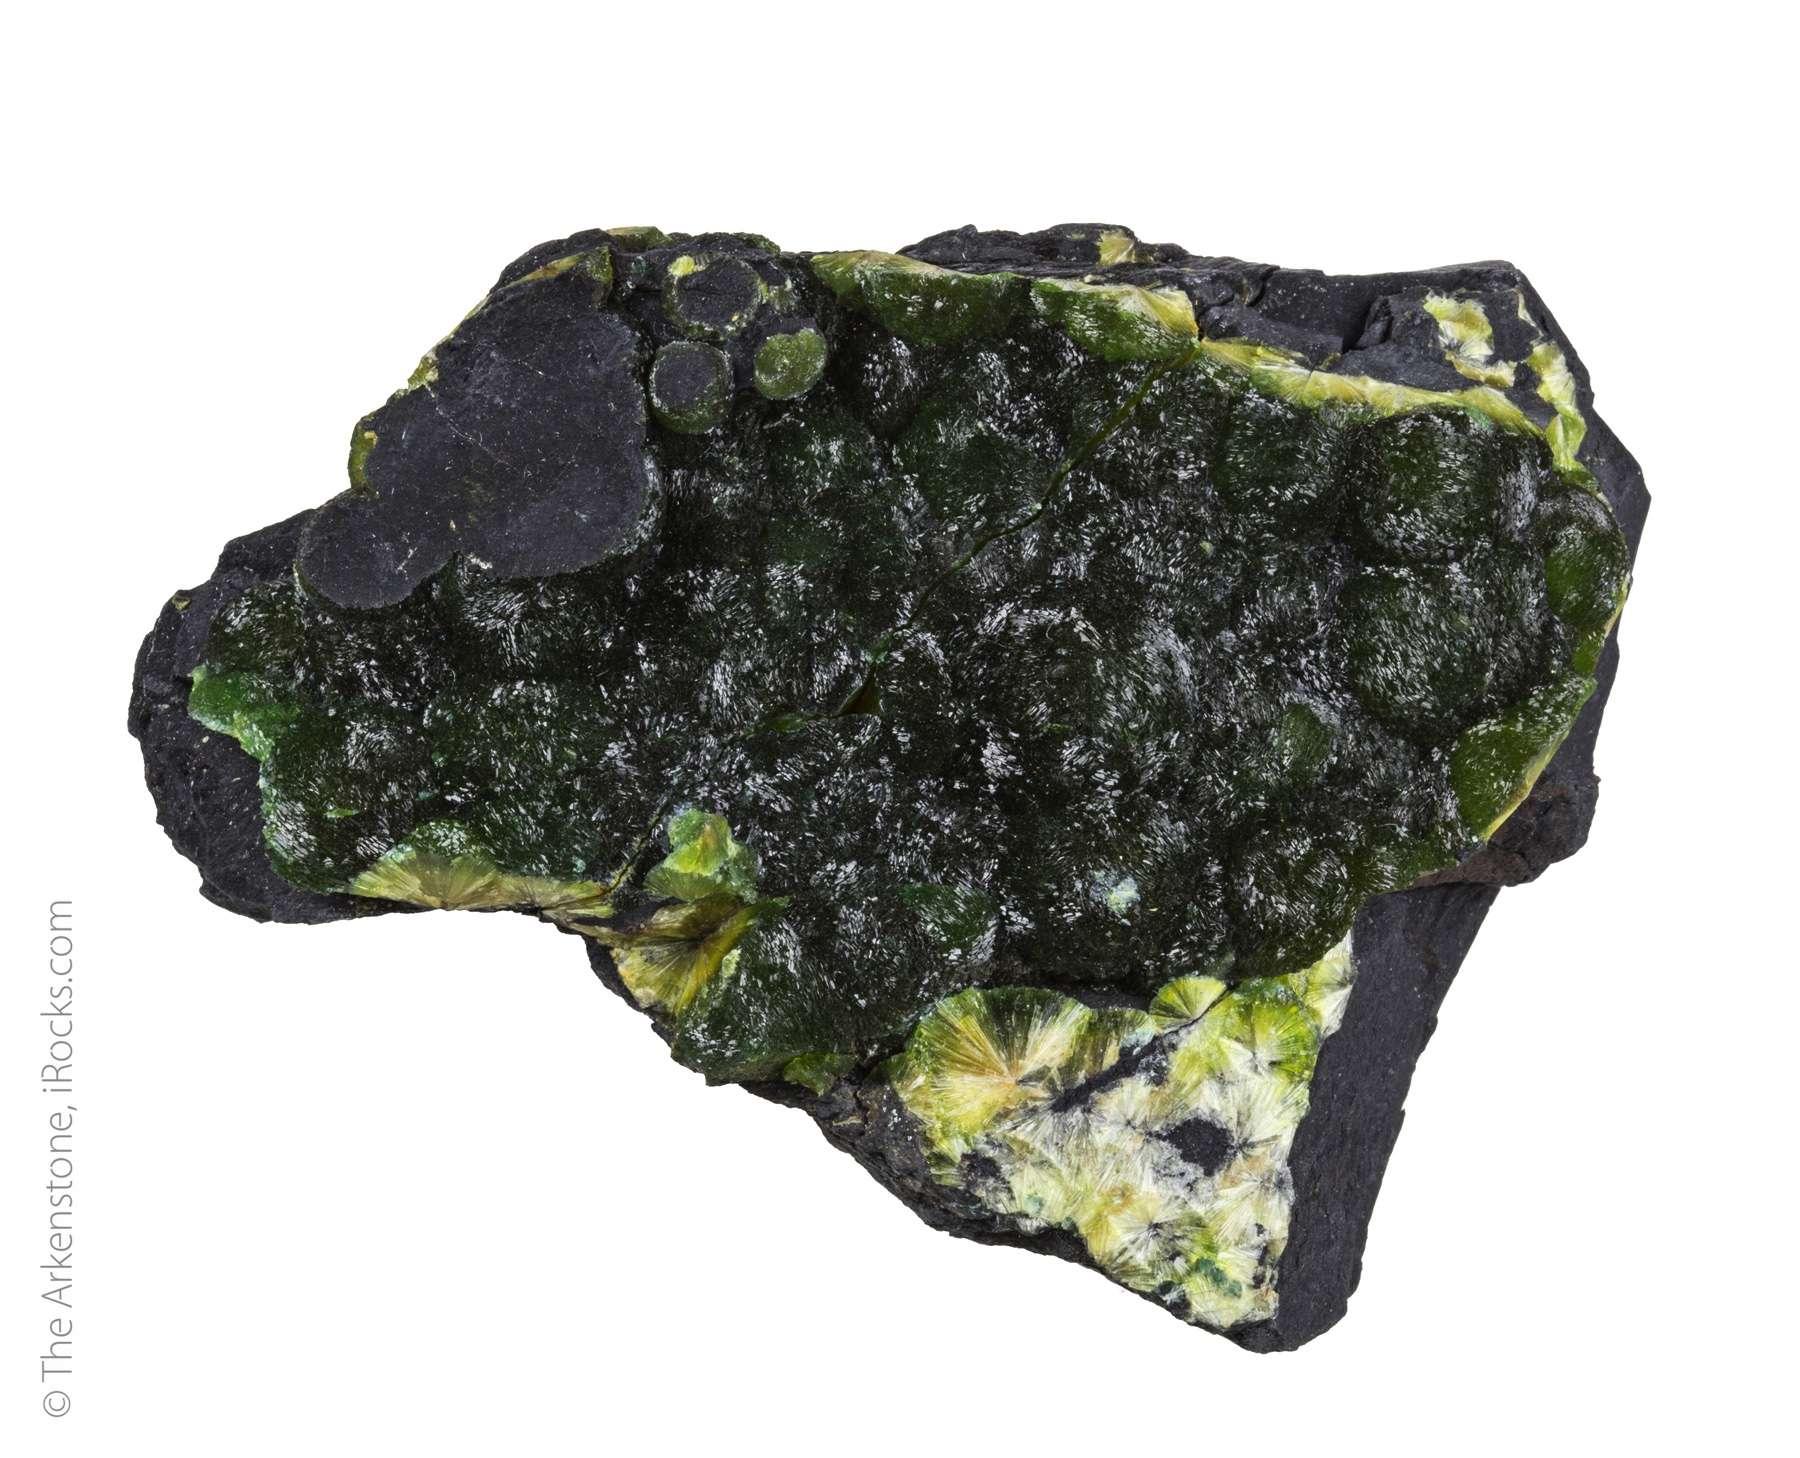 Almost covering black shale matrix glistening hemispheres 1 5 cm